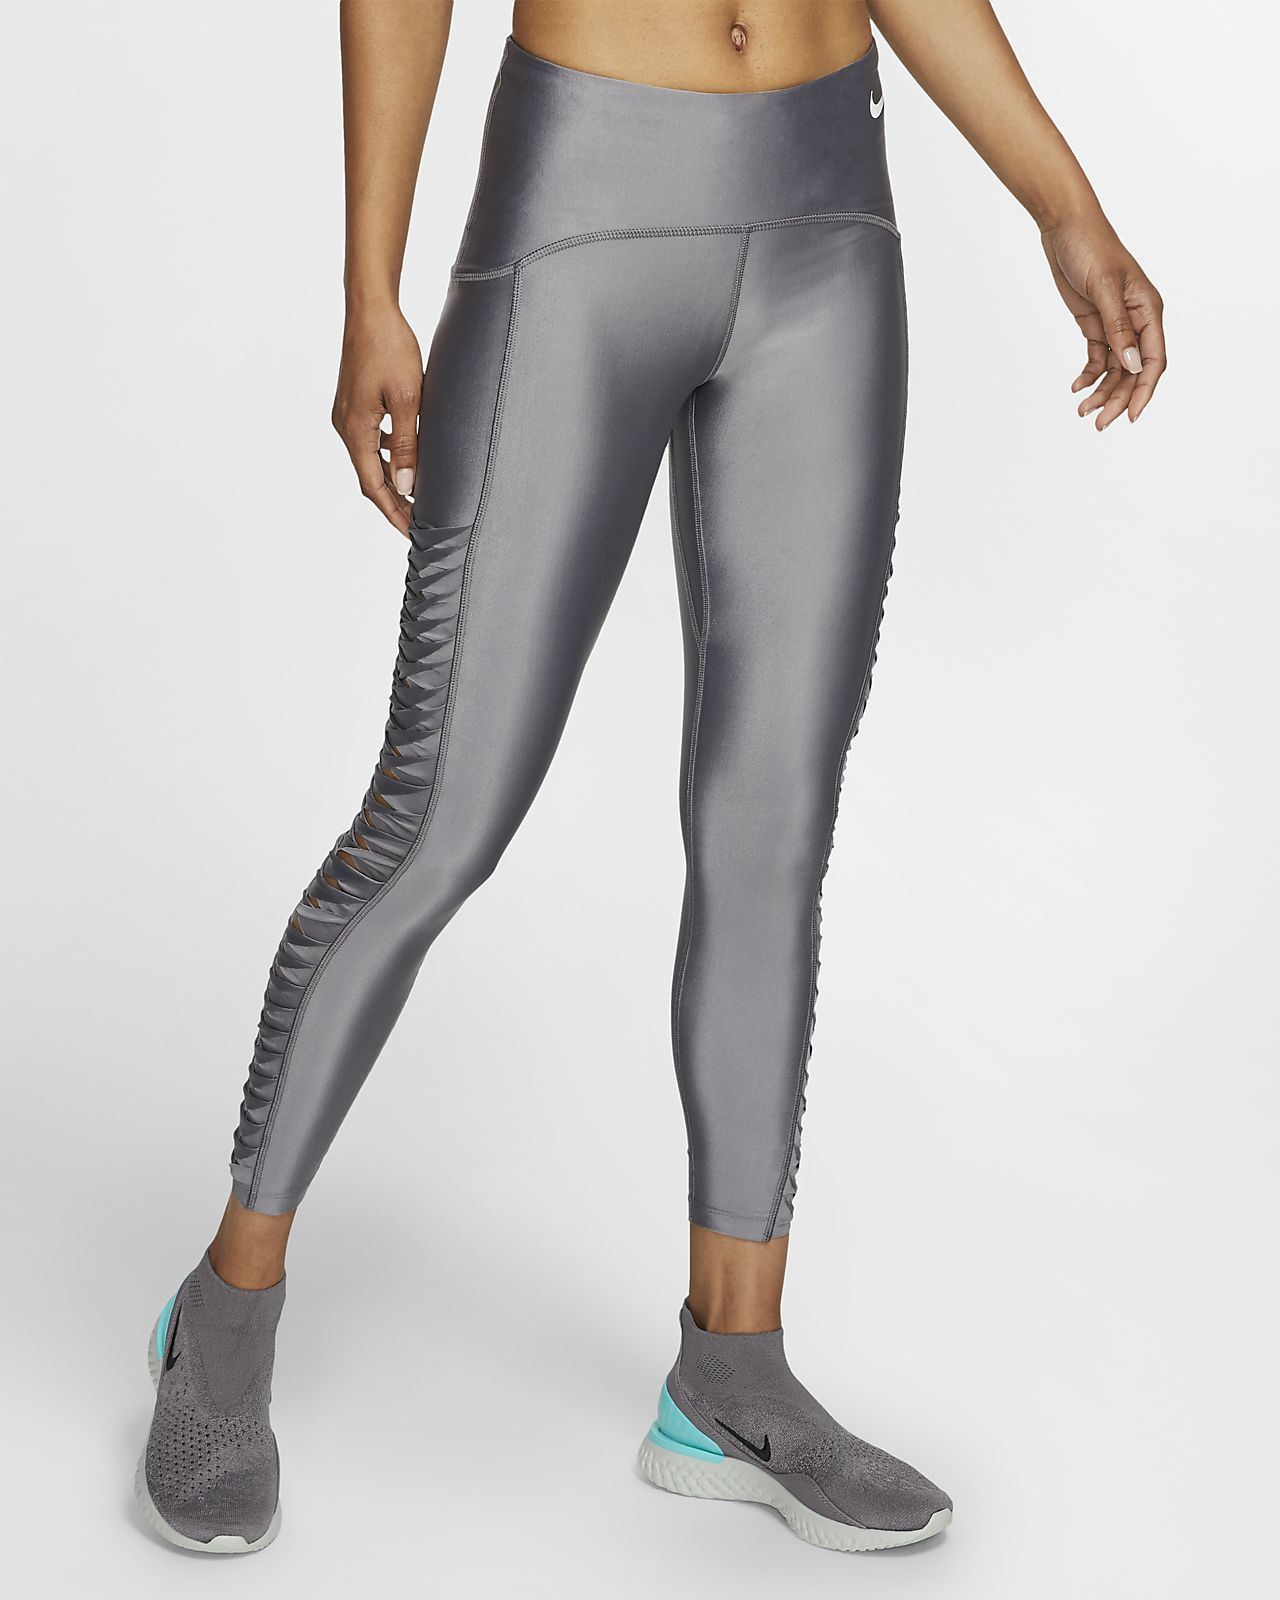 Nike Speed Mallas de running de 7/8 - Mujer